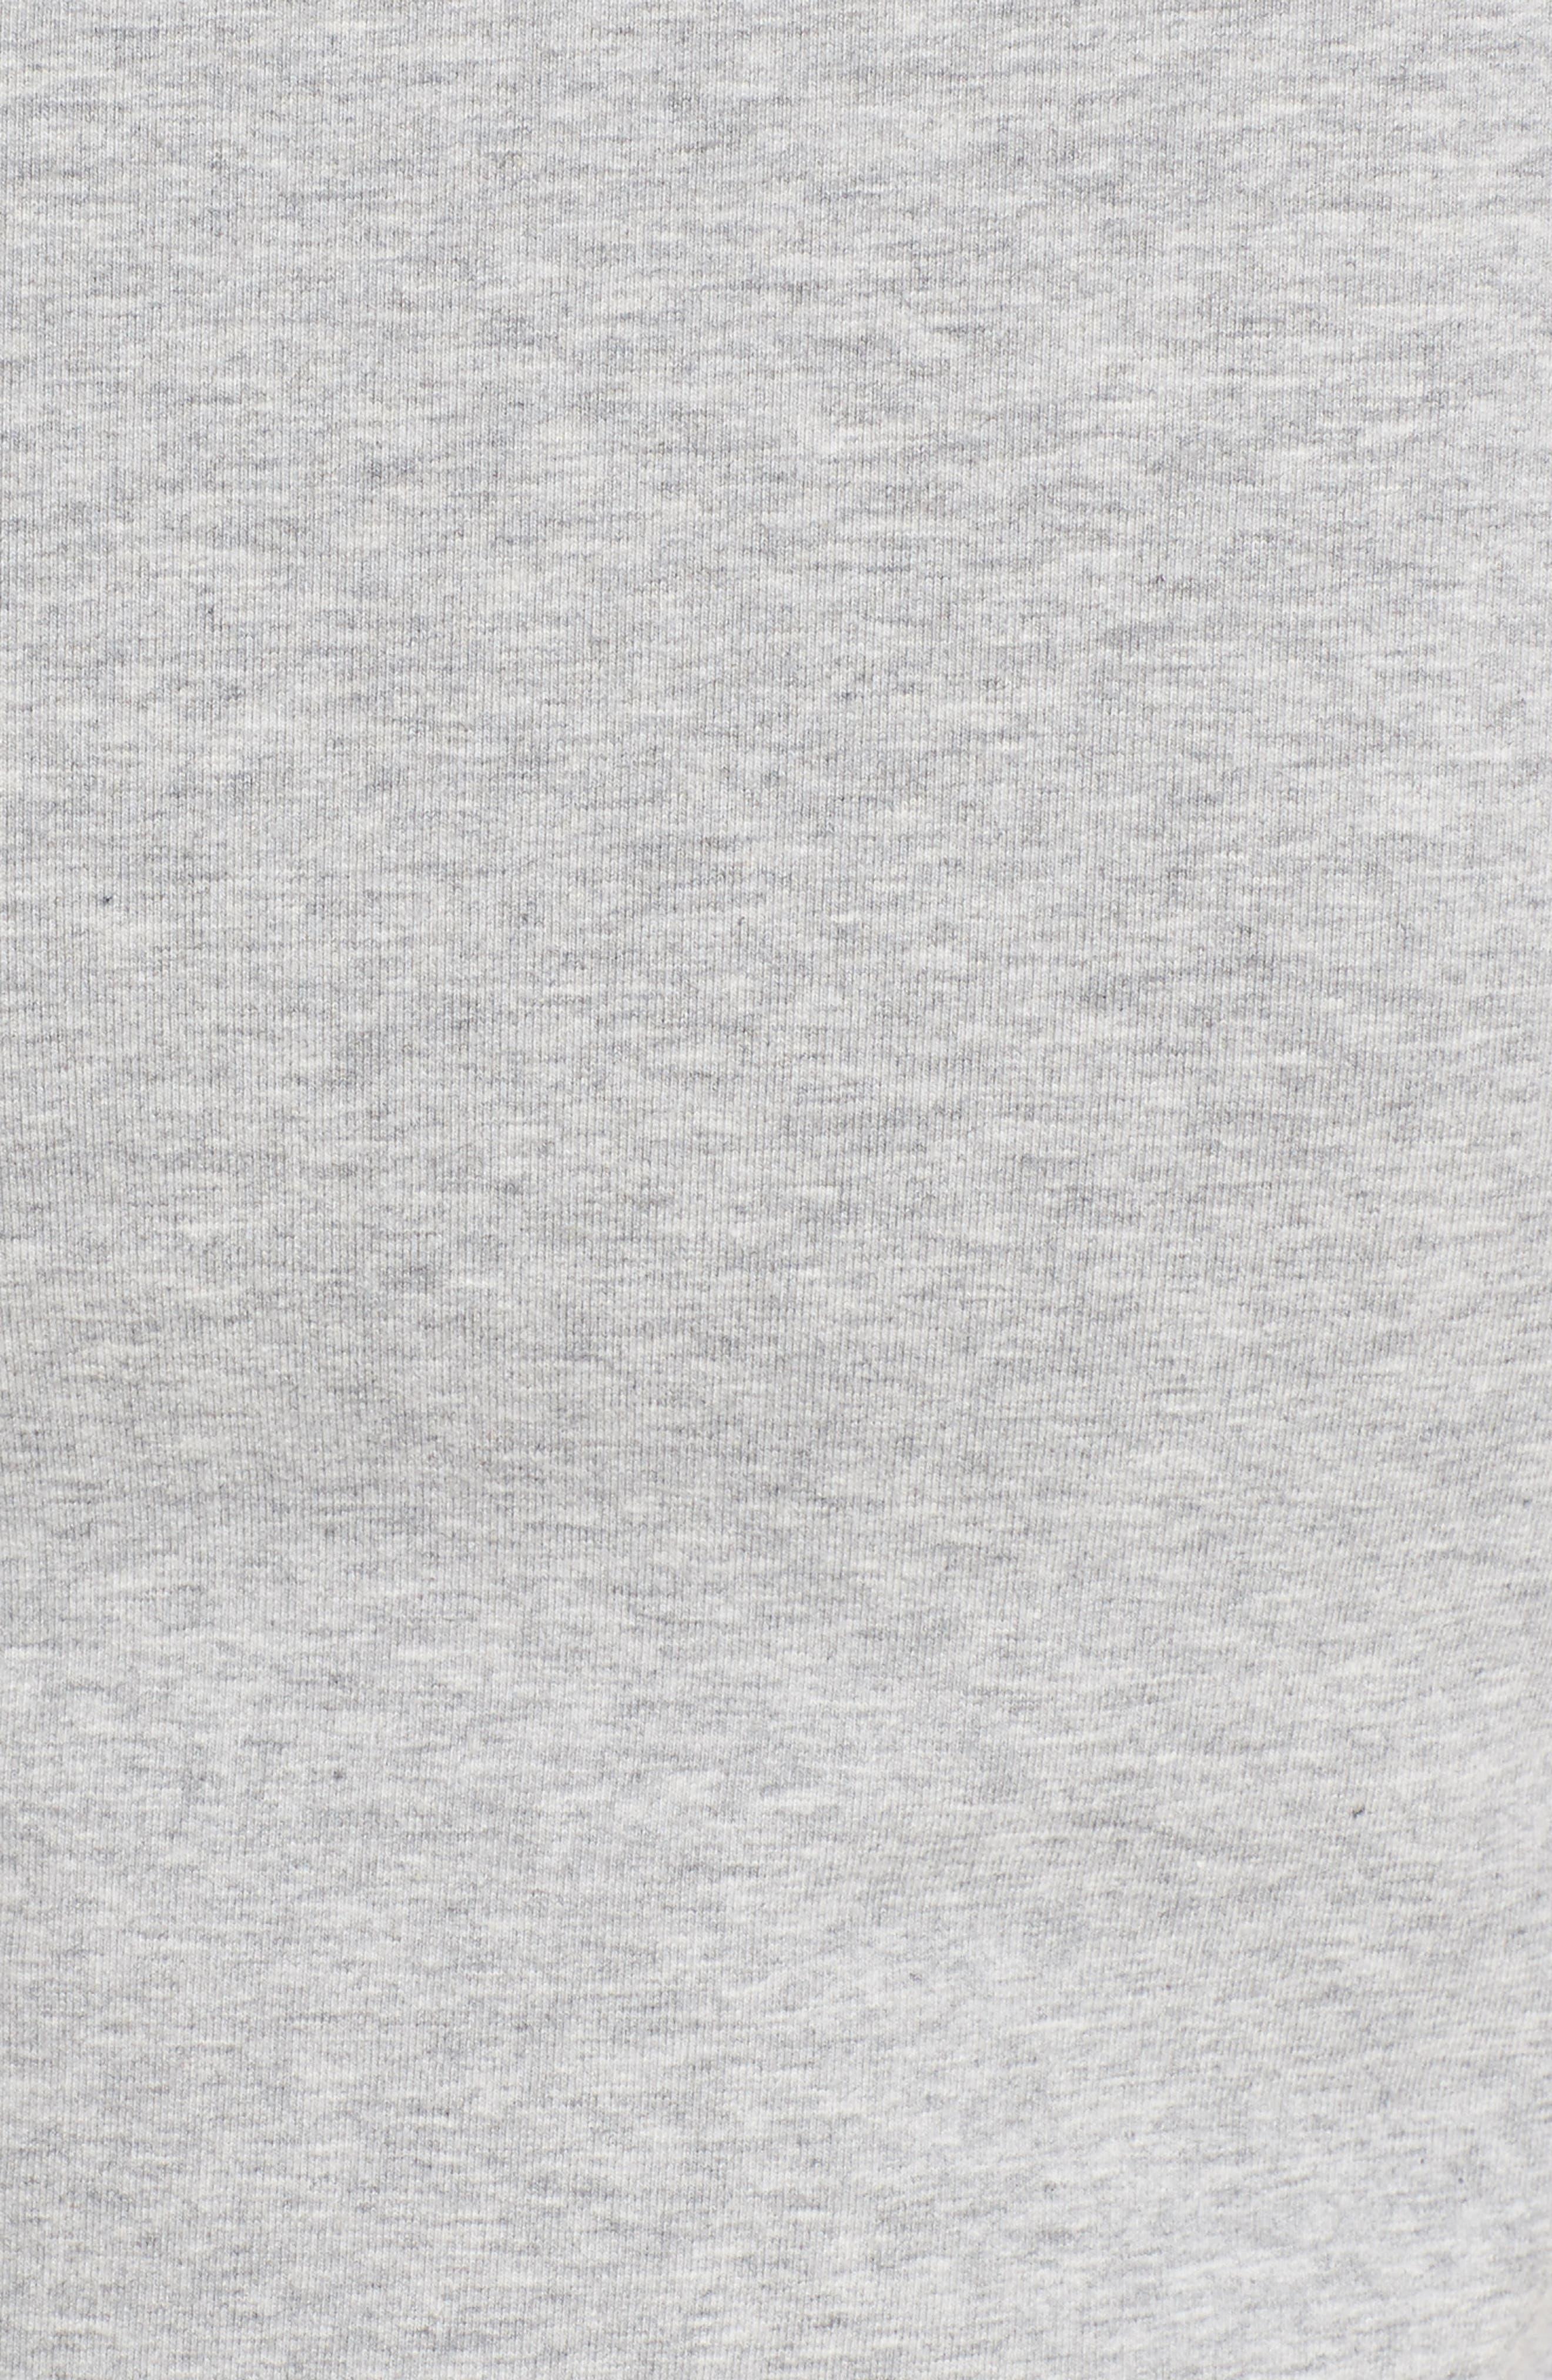 Lace-Up Sweatshirt,                             Alternate thumbnail 5, color,                             050